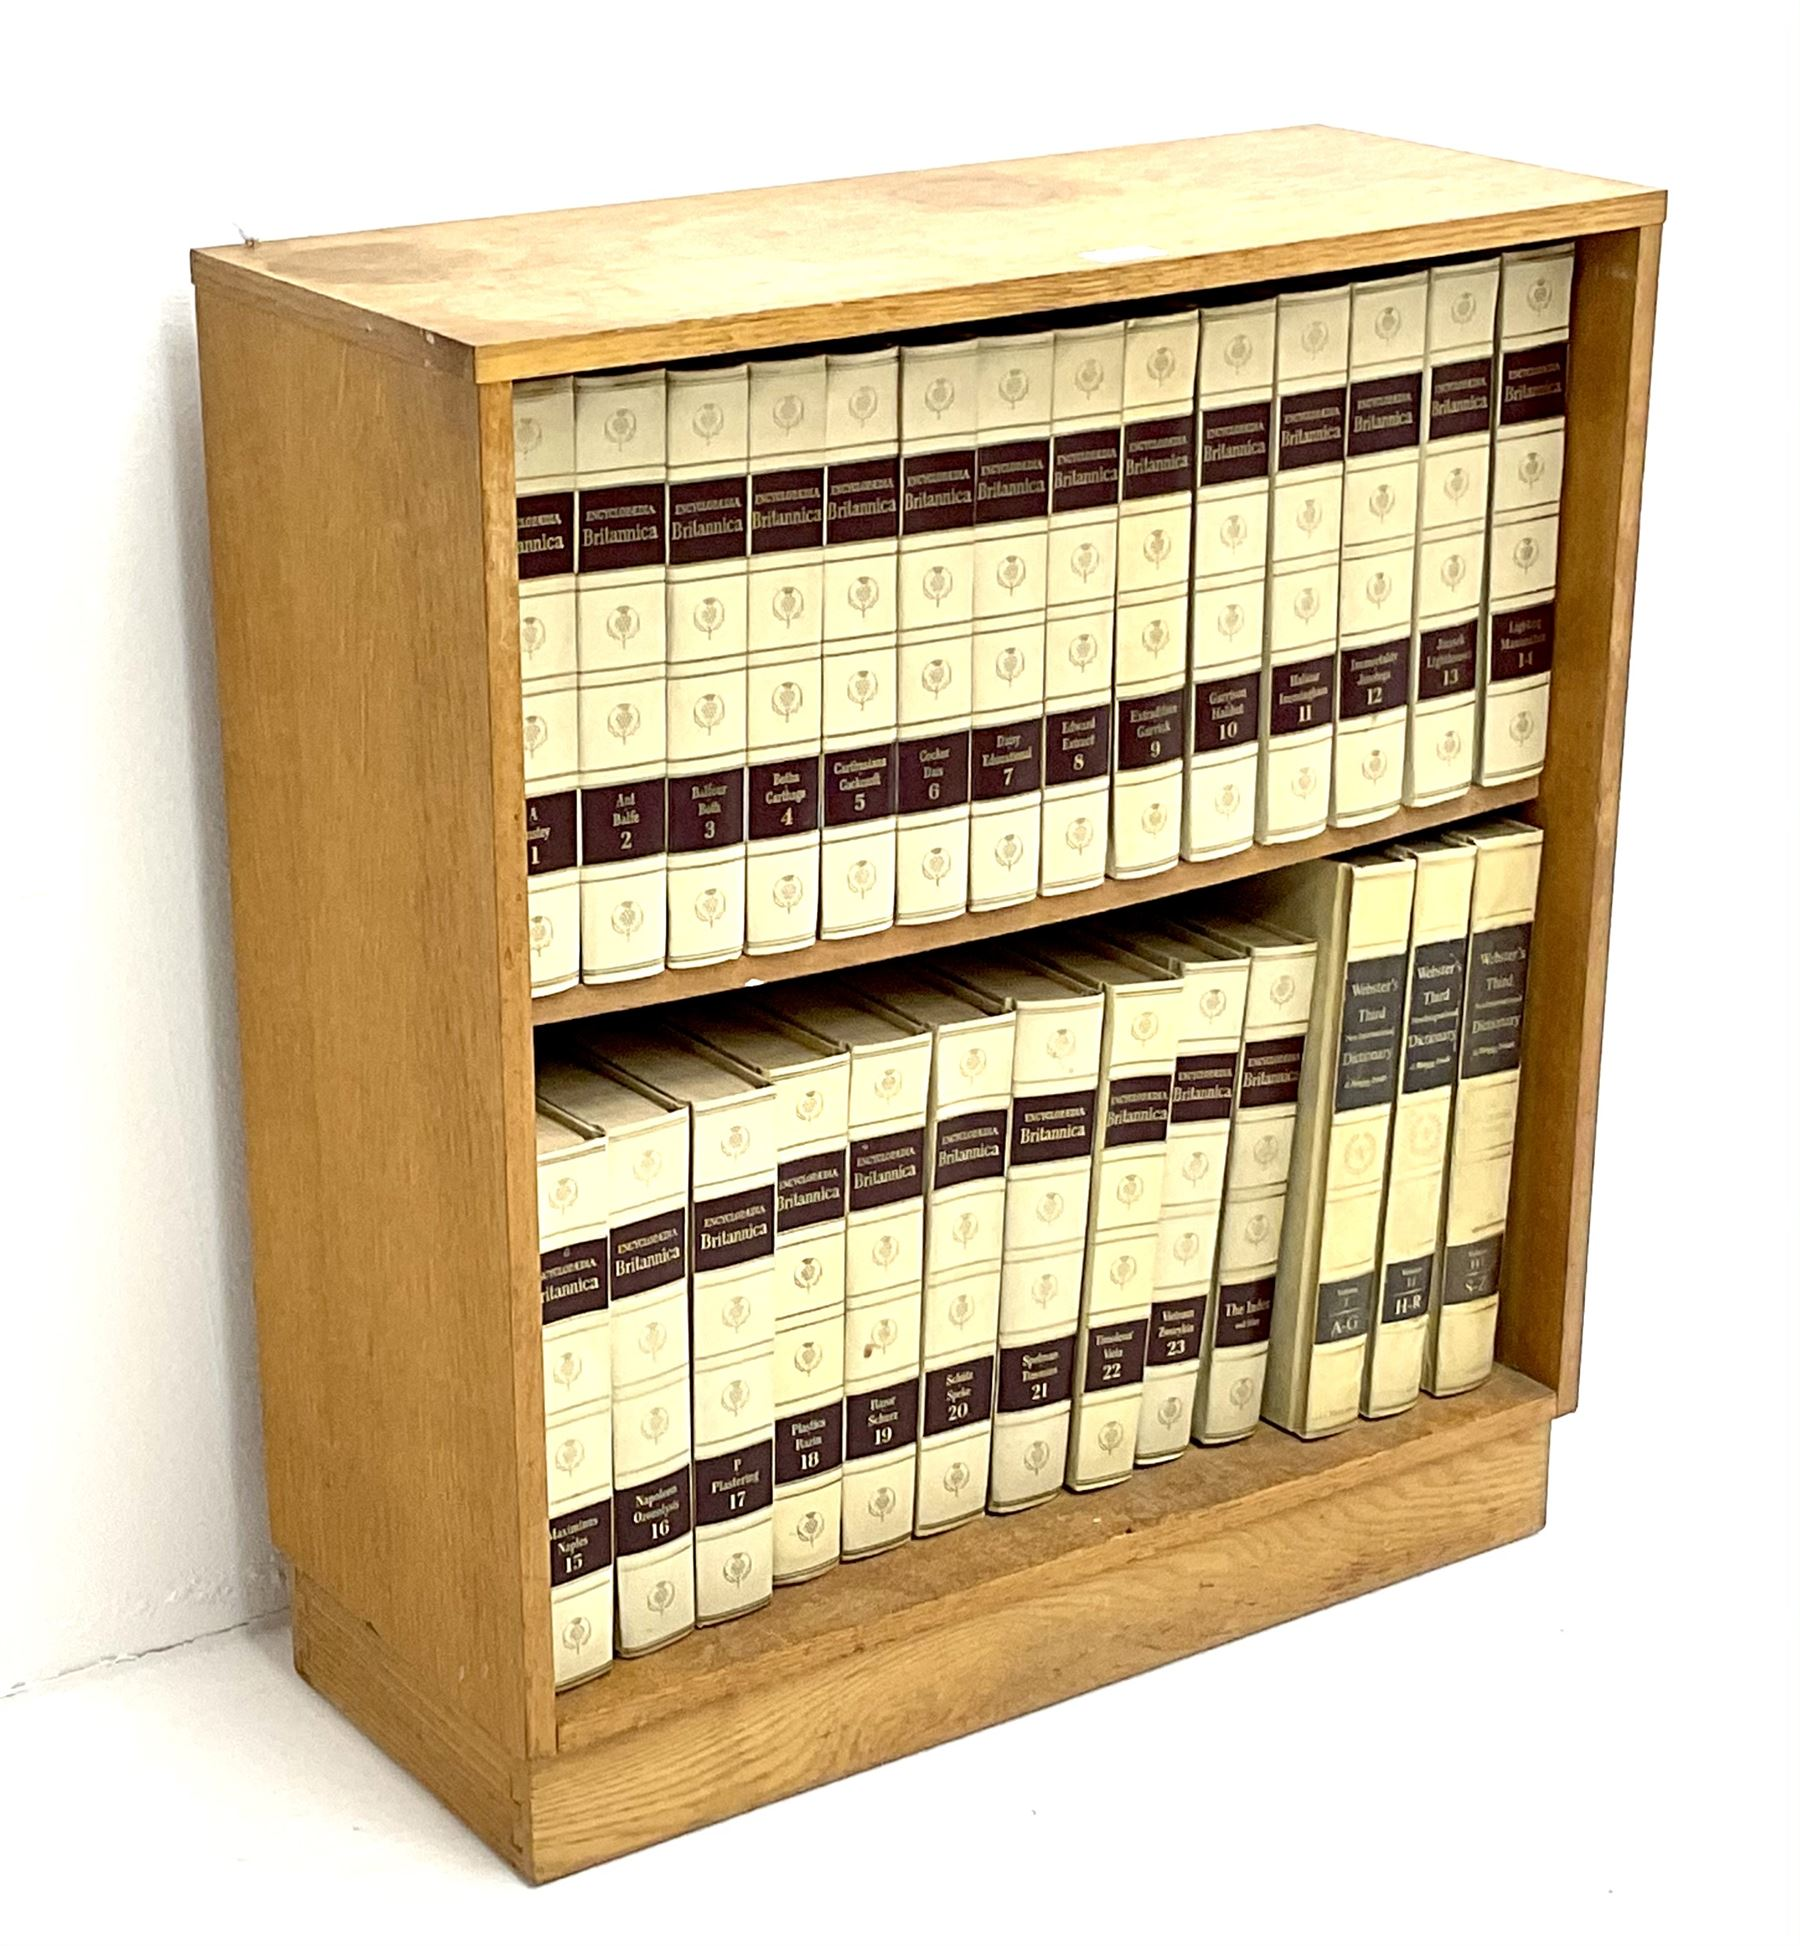 Light oak bookcase with Encylopedia Britania